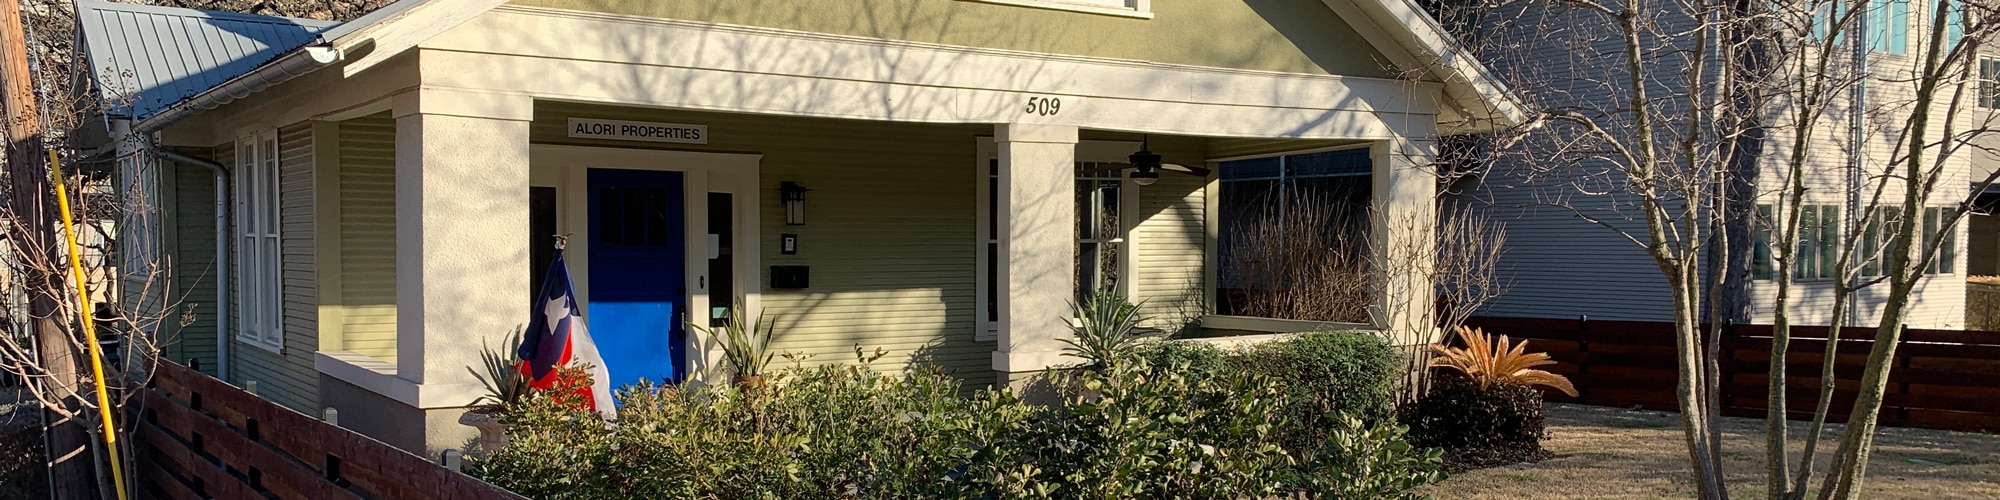 509 Oakland Exterior